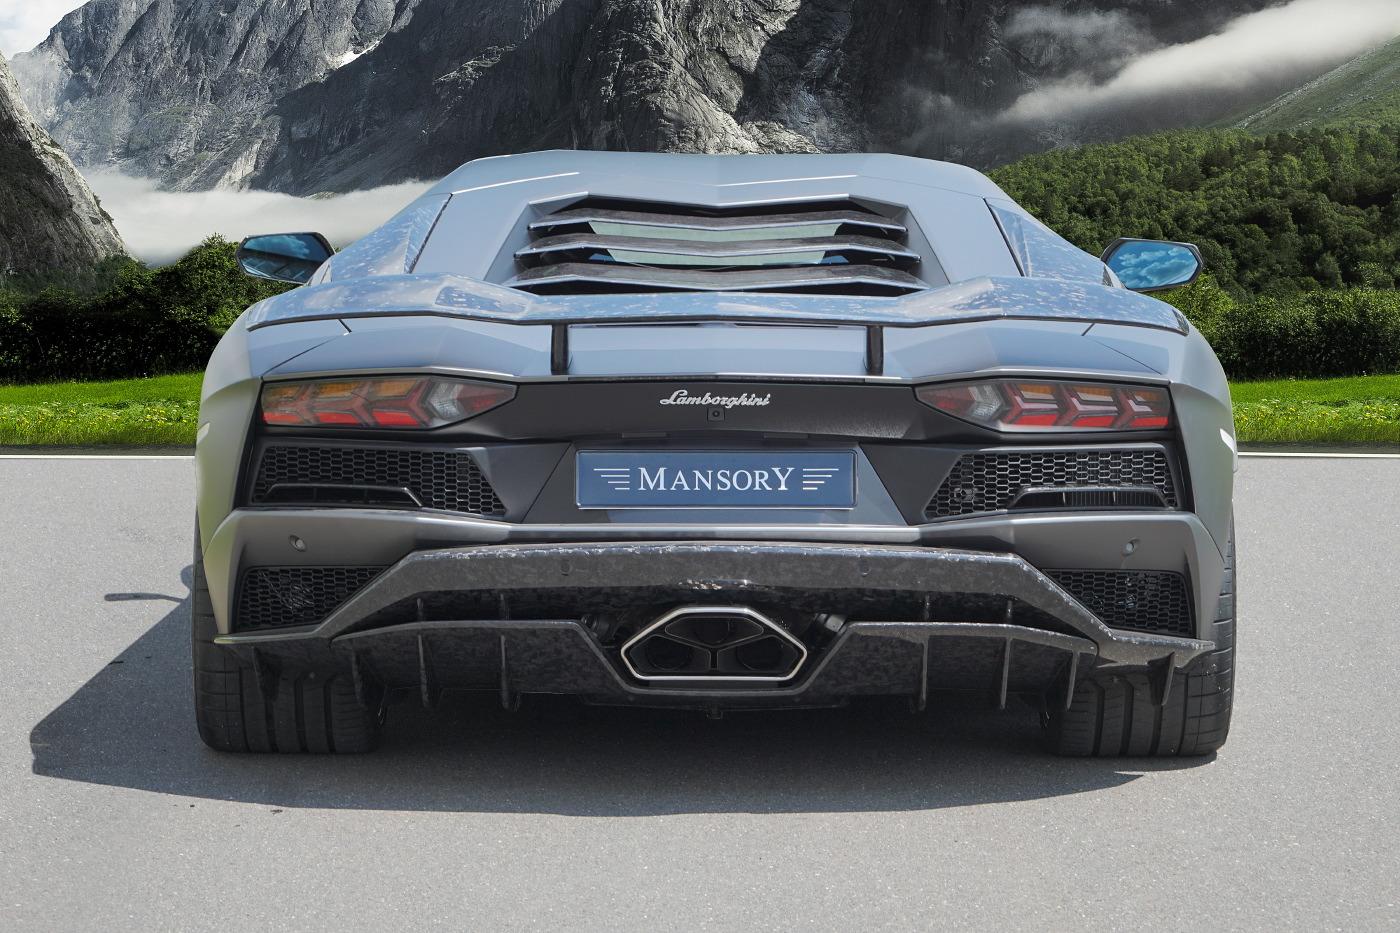 Mansory Lamborghini Aventador S Revealed Gtspirit